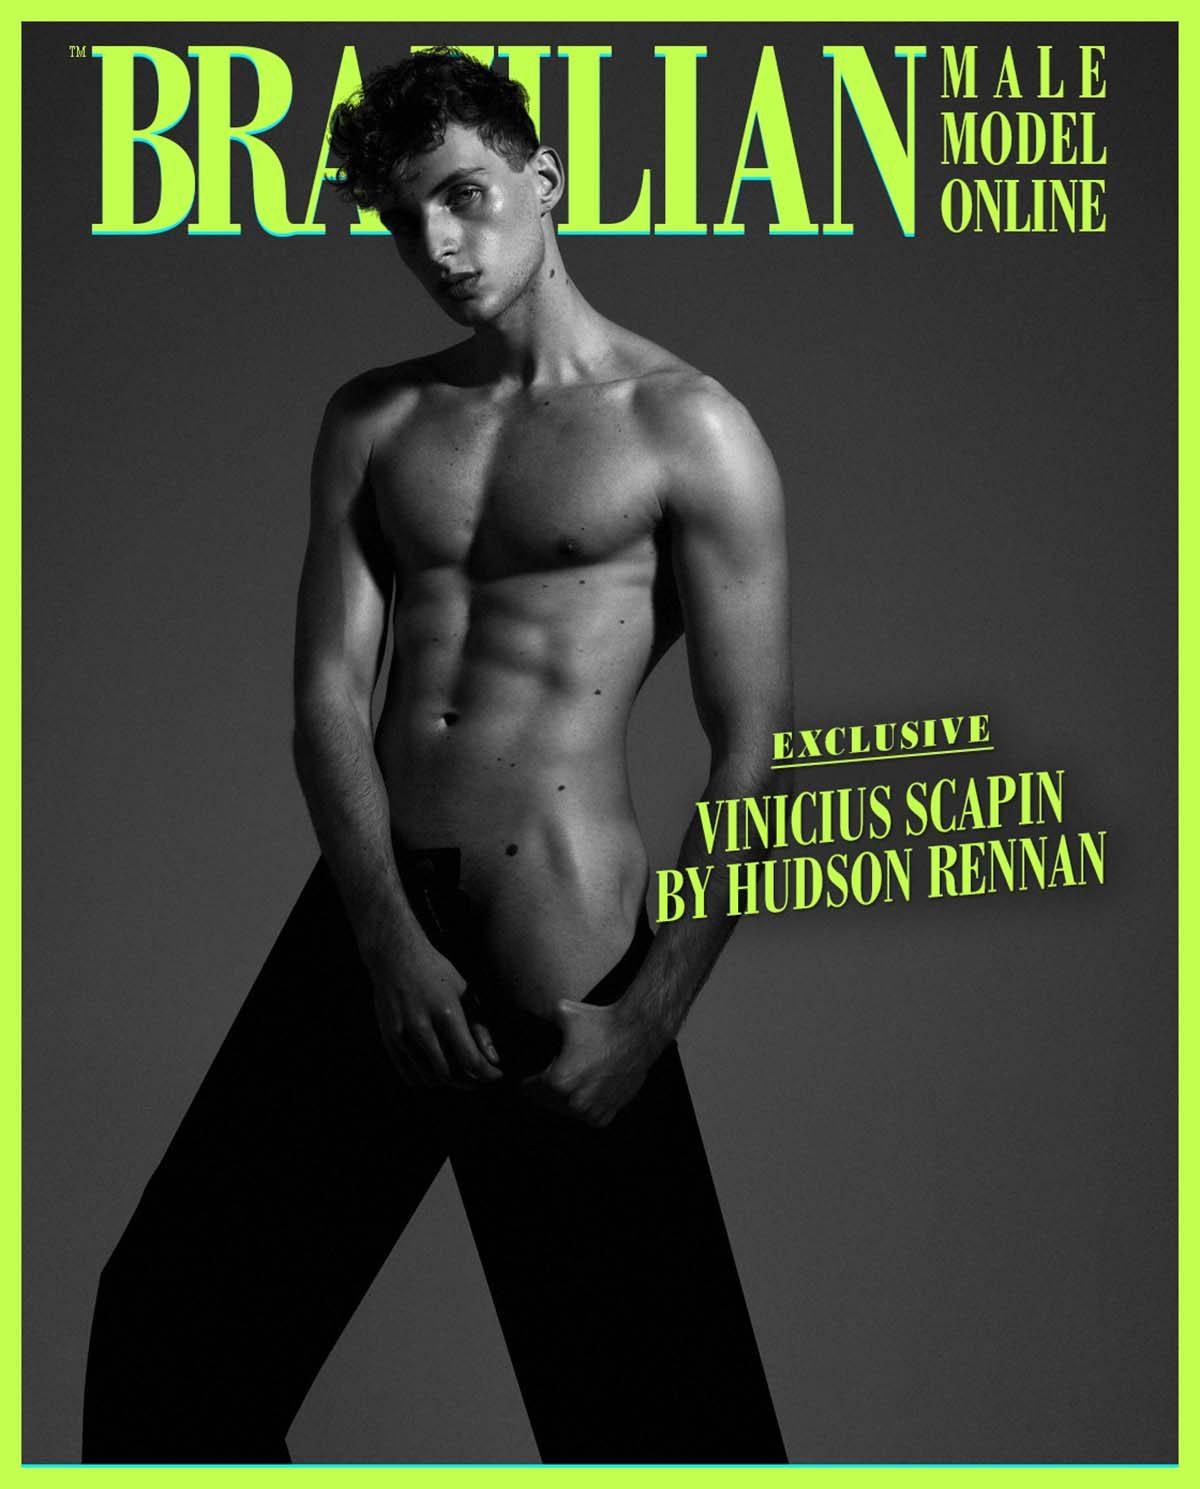 Vinicius Scapin by Hudson Rennan